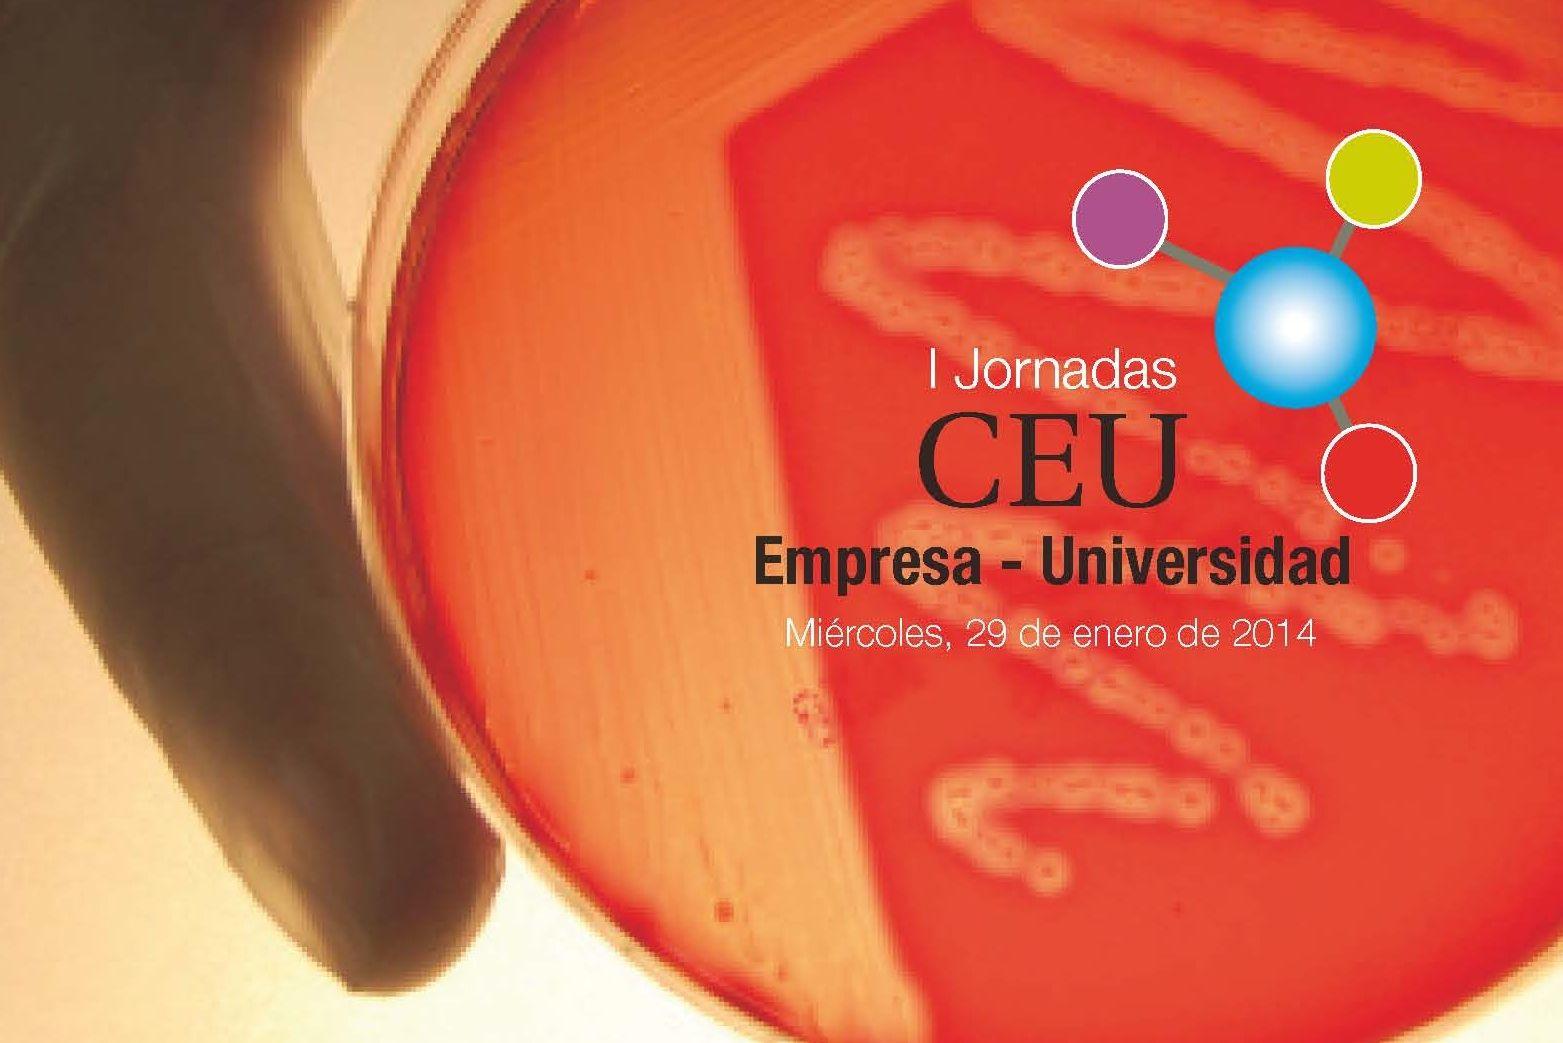 I Jornadas CEU Empresa-Universidad.